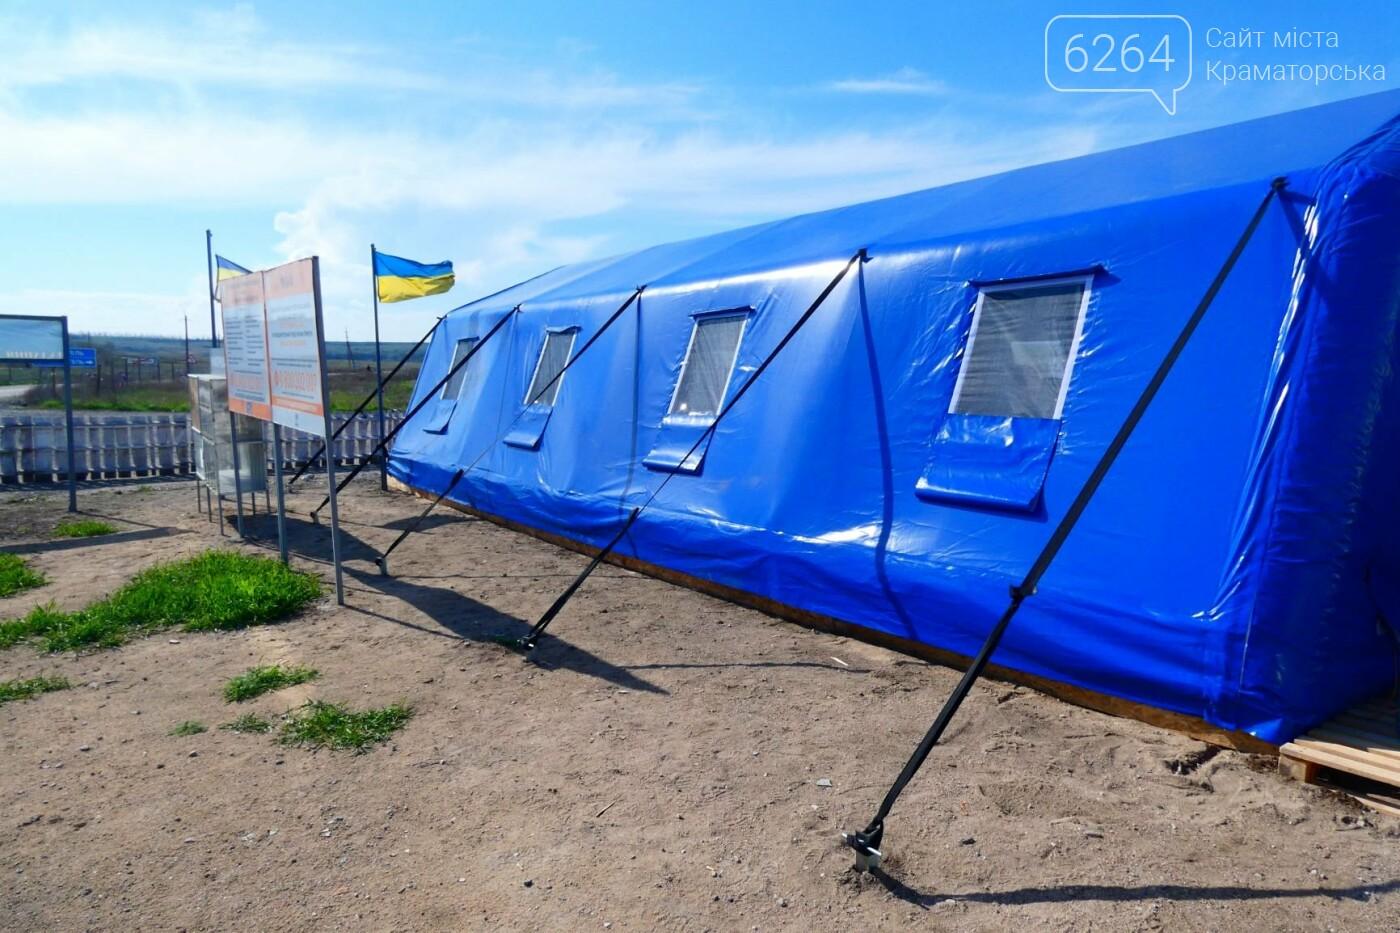 В Донецкой области обновили модули пунктов оказания помощи при КПВВ, фото-1